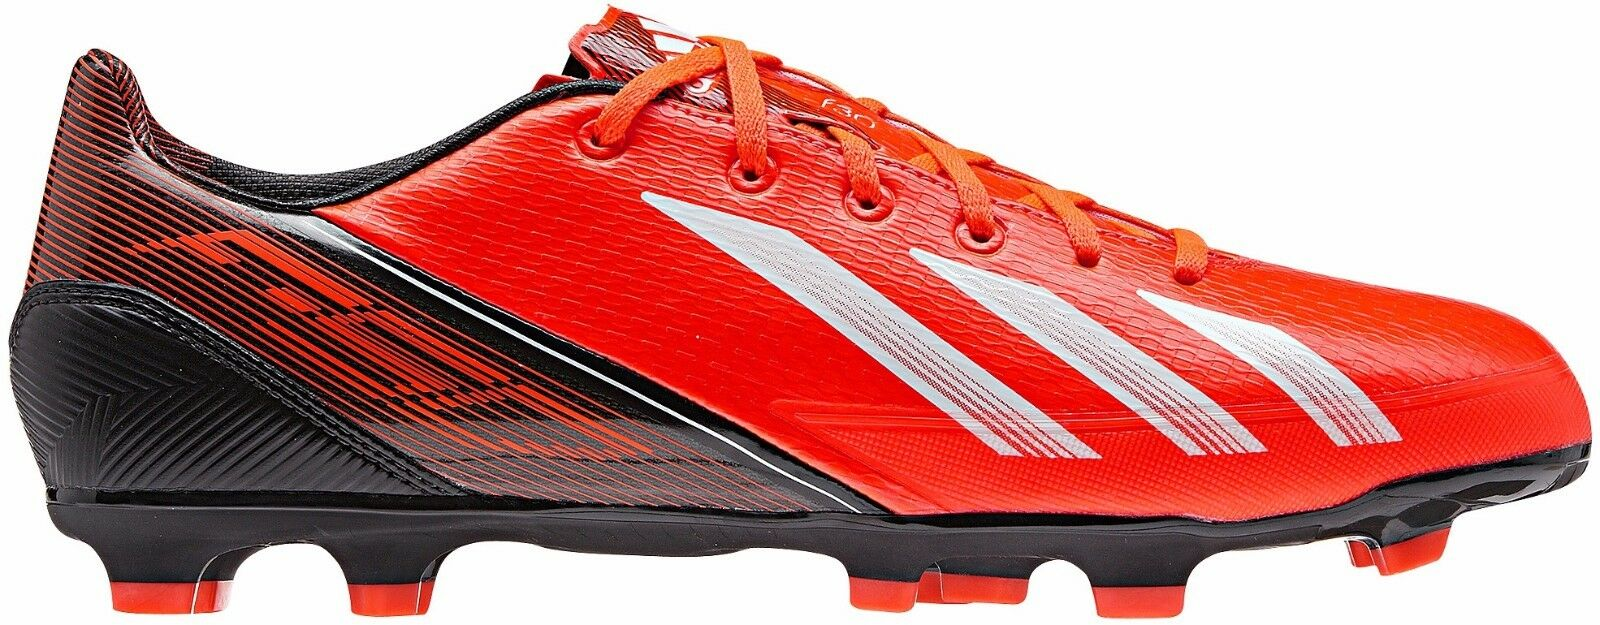 Men's Adidas F30 TRX FG Soccer Cleats - Red/White/Black - NIB!